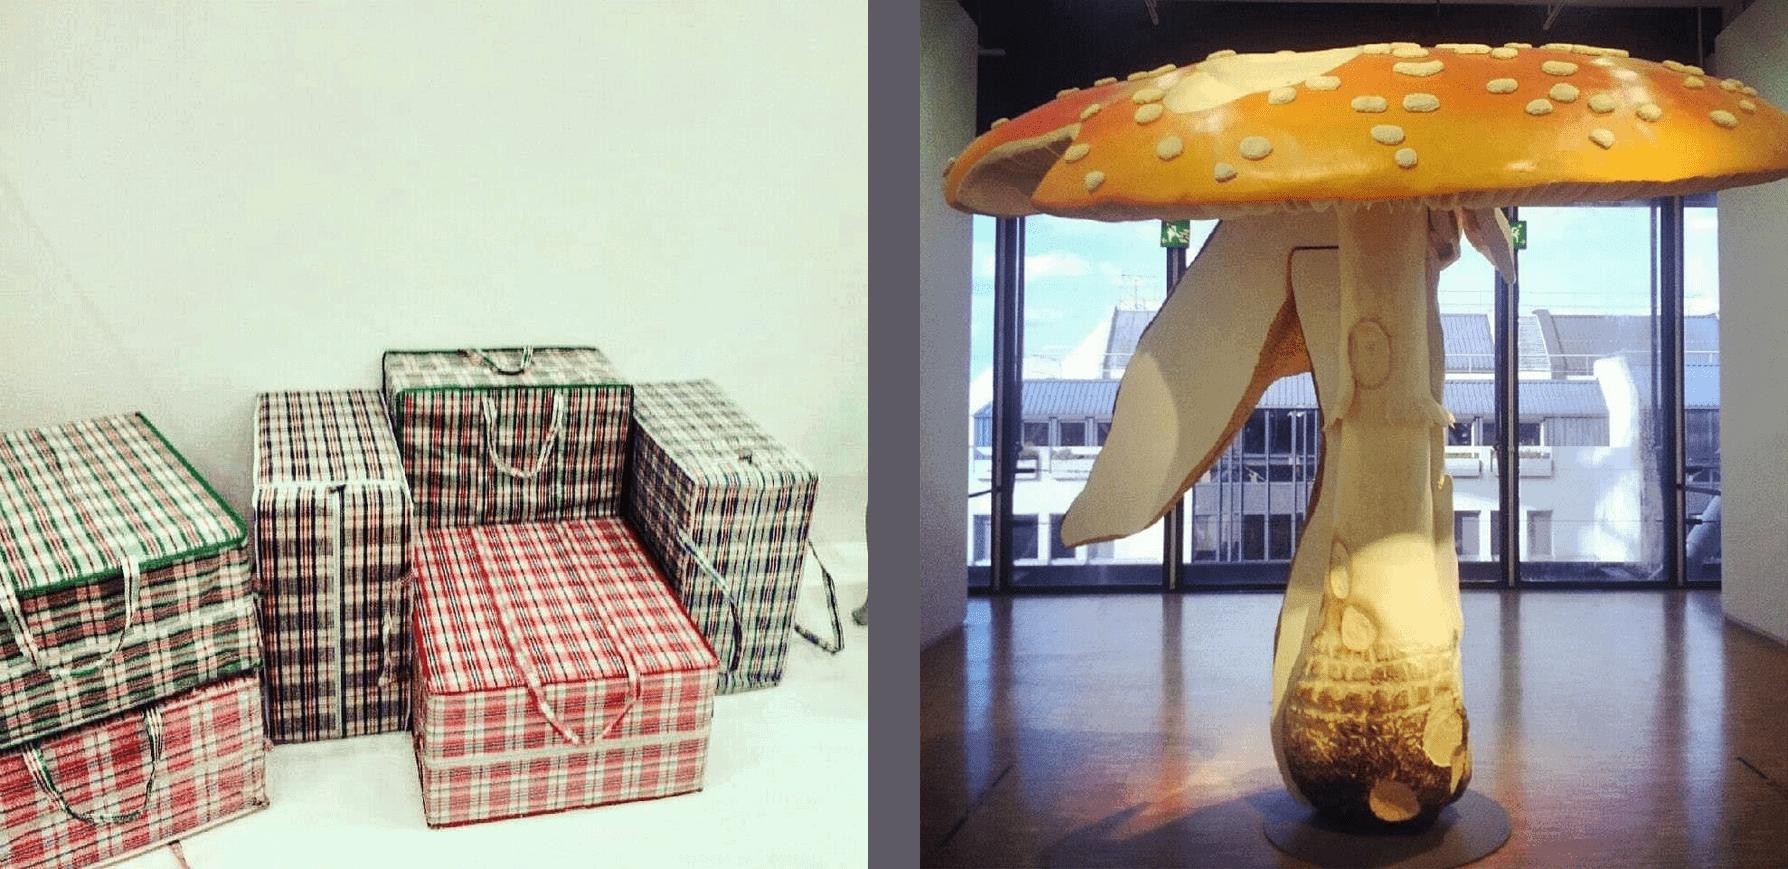 Absurd-w-sztuce-Matala-Crasset-Poufs-Digestion-i-Carsten-Höller- Giant-Triple-Mushroom